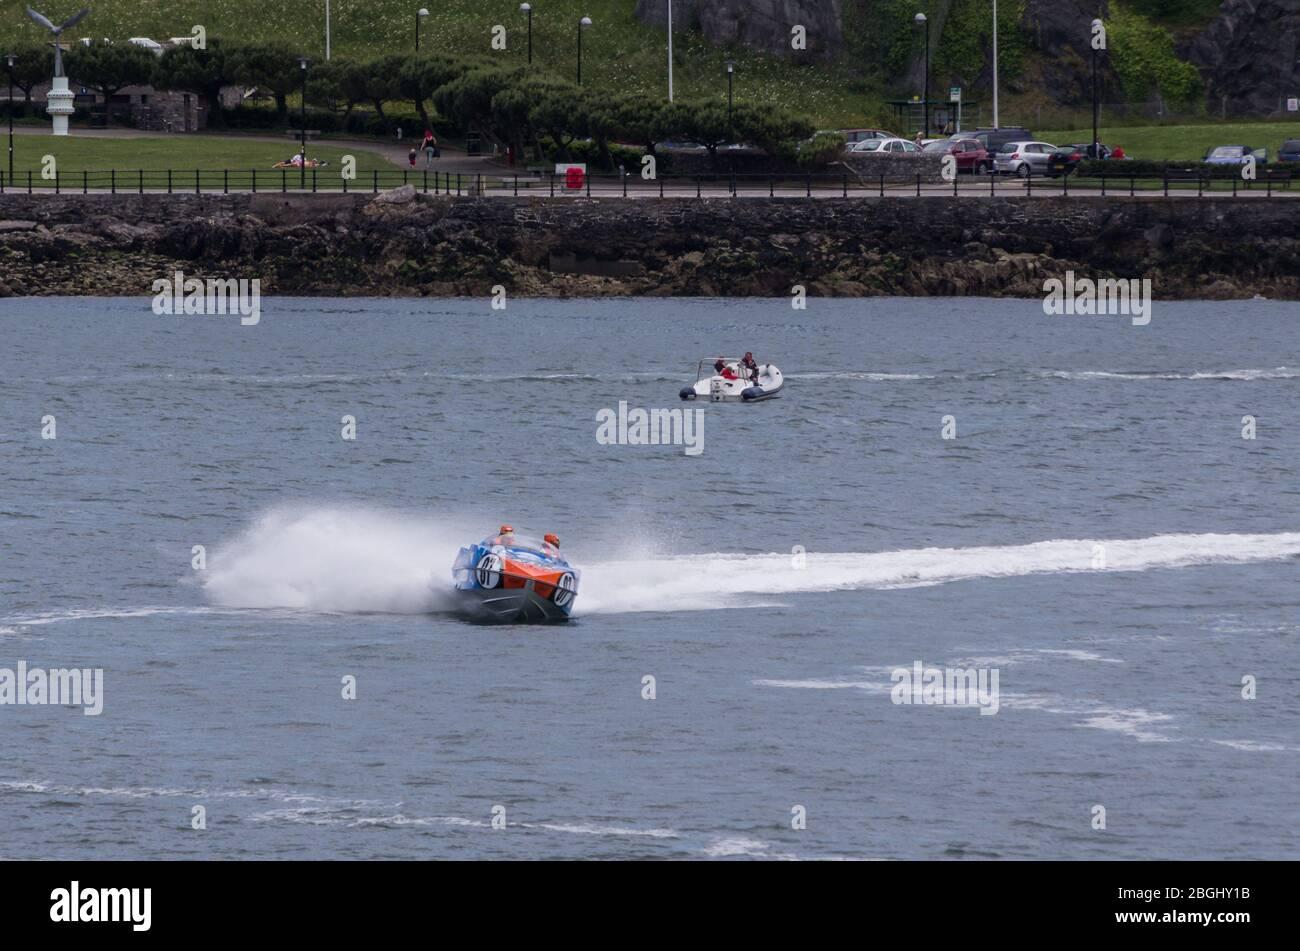 Barco de motor P1 Superstock racing, Plymouth 29 Junio 2013 Foto de stock